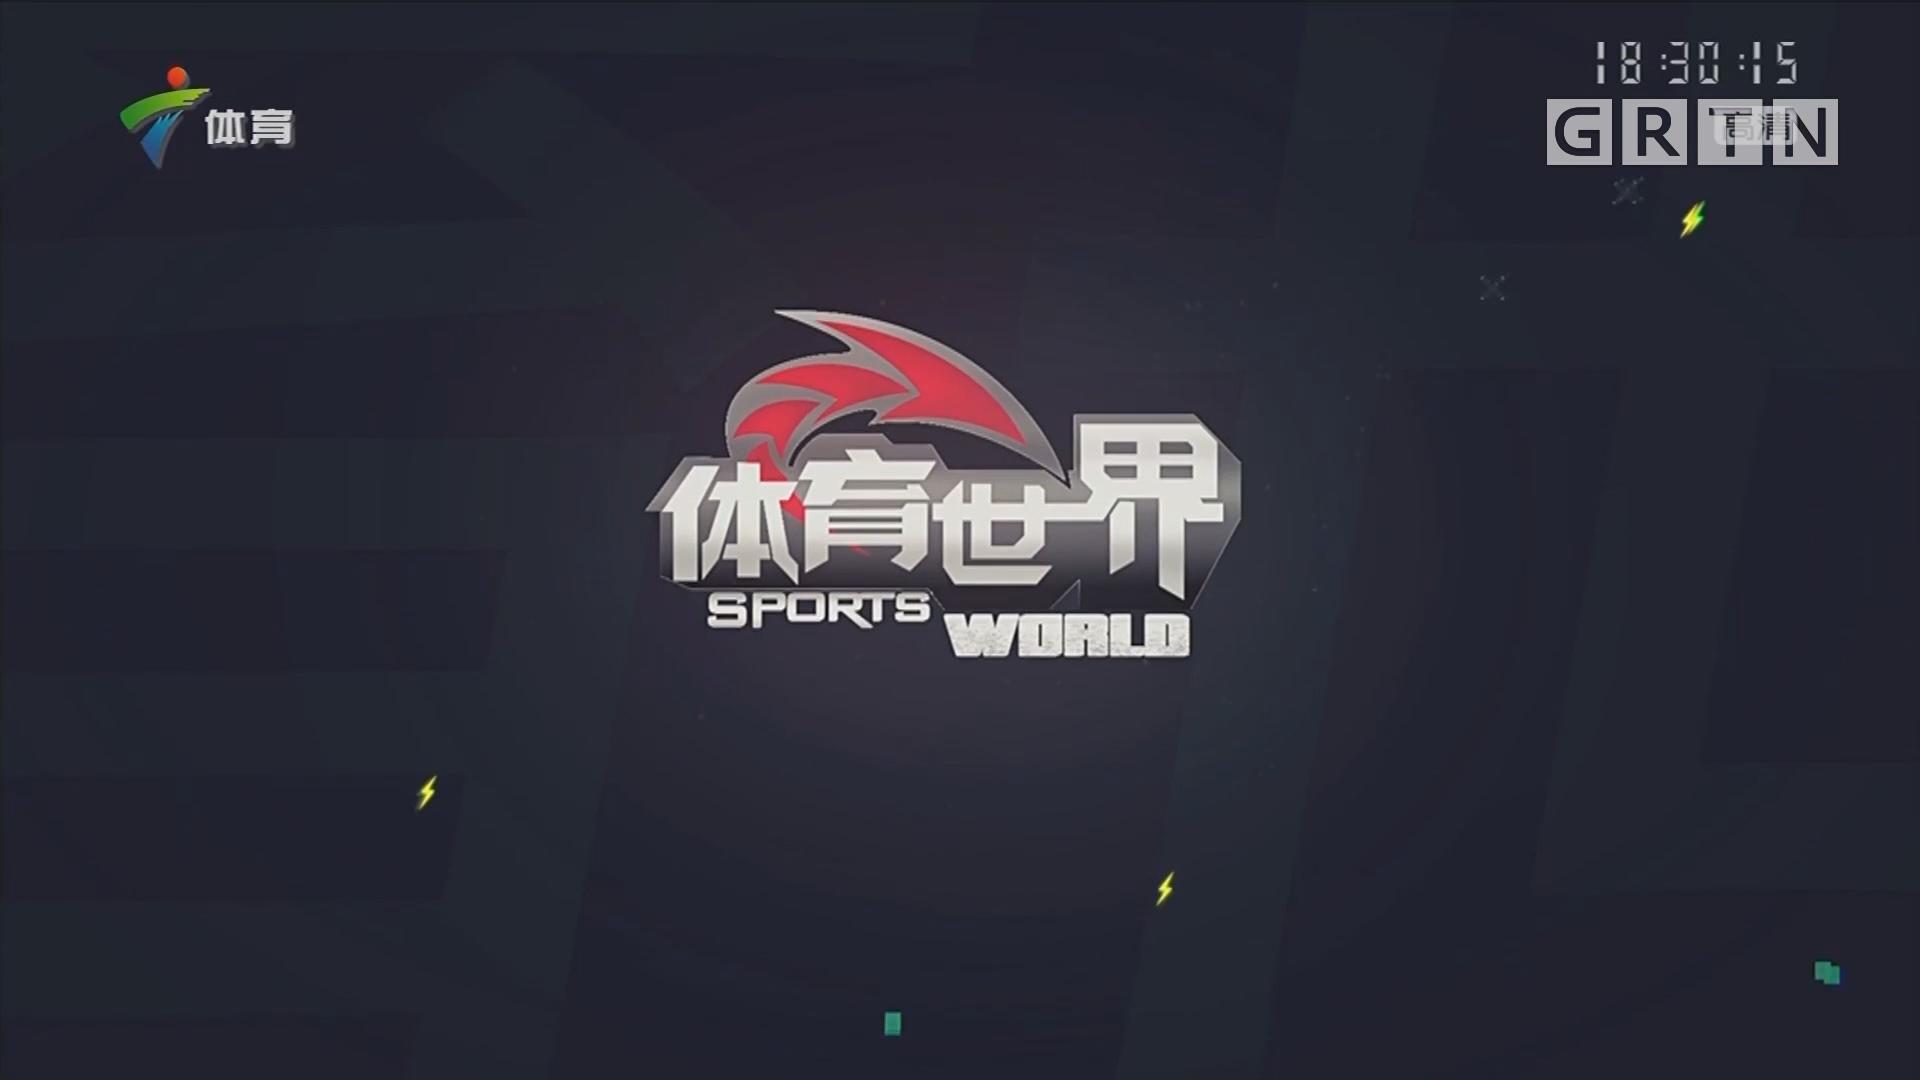 [HD][2019-01-08]体育世界:白云区校园篮球 决出新王者